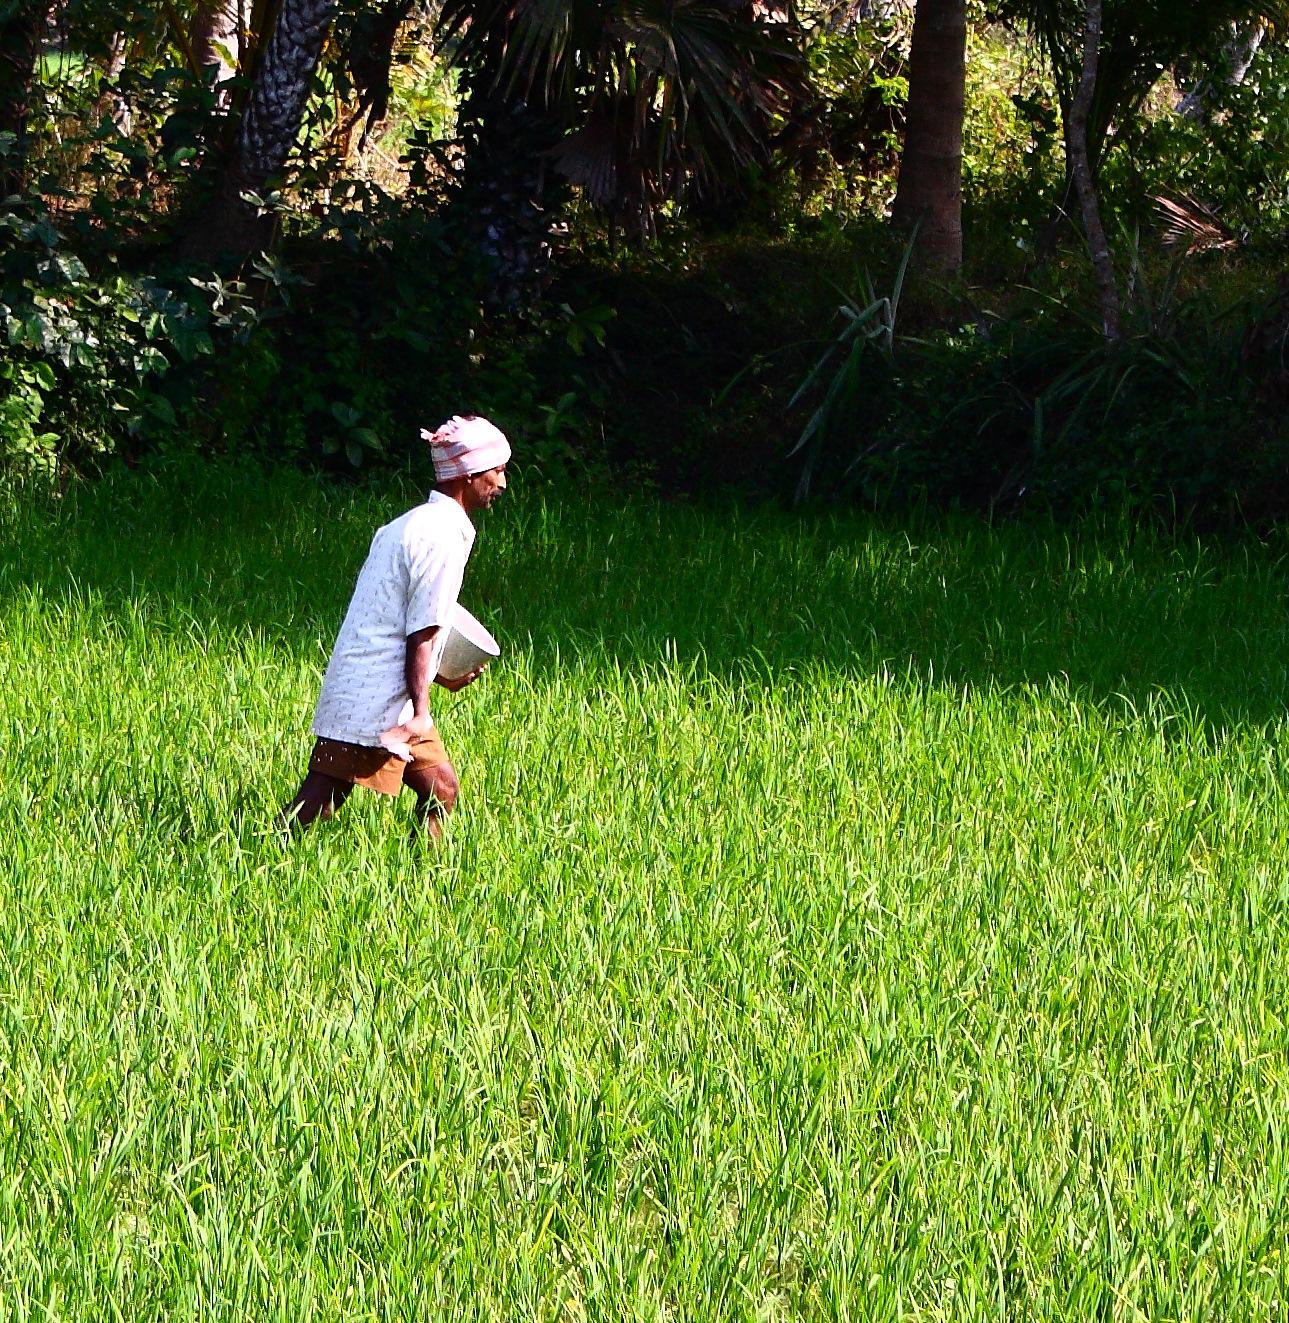 An Indian farmer spreading fertiliser over a crop. Photo credit: Kiran Kumar/Wikimedia Commons [Licensed under CC BY 2.0]